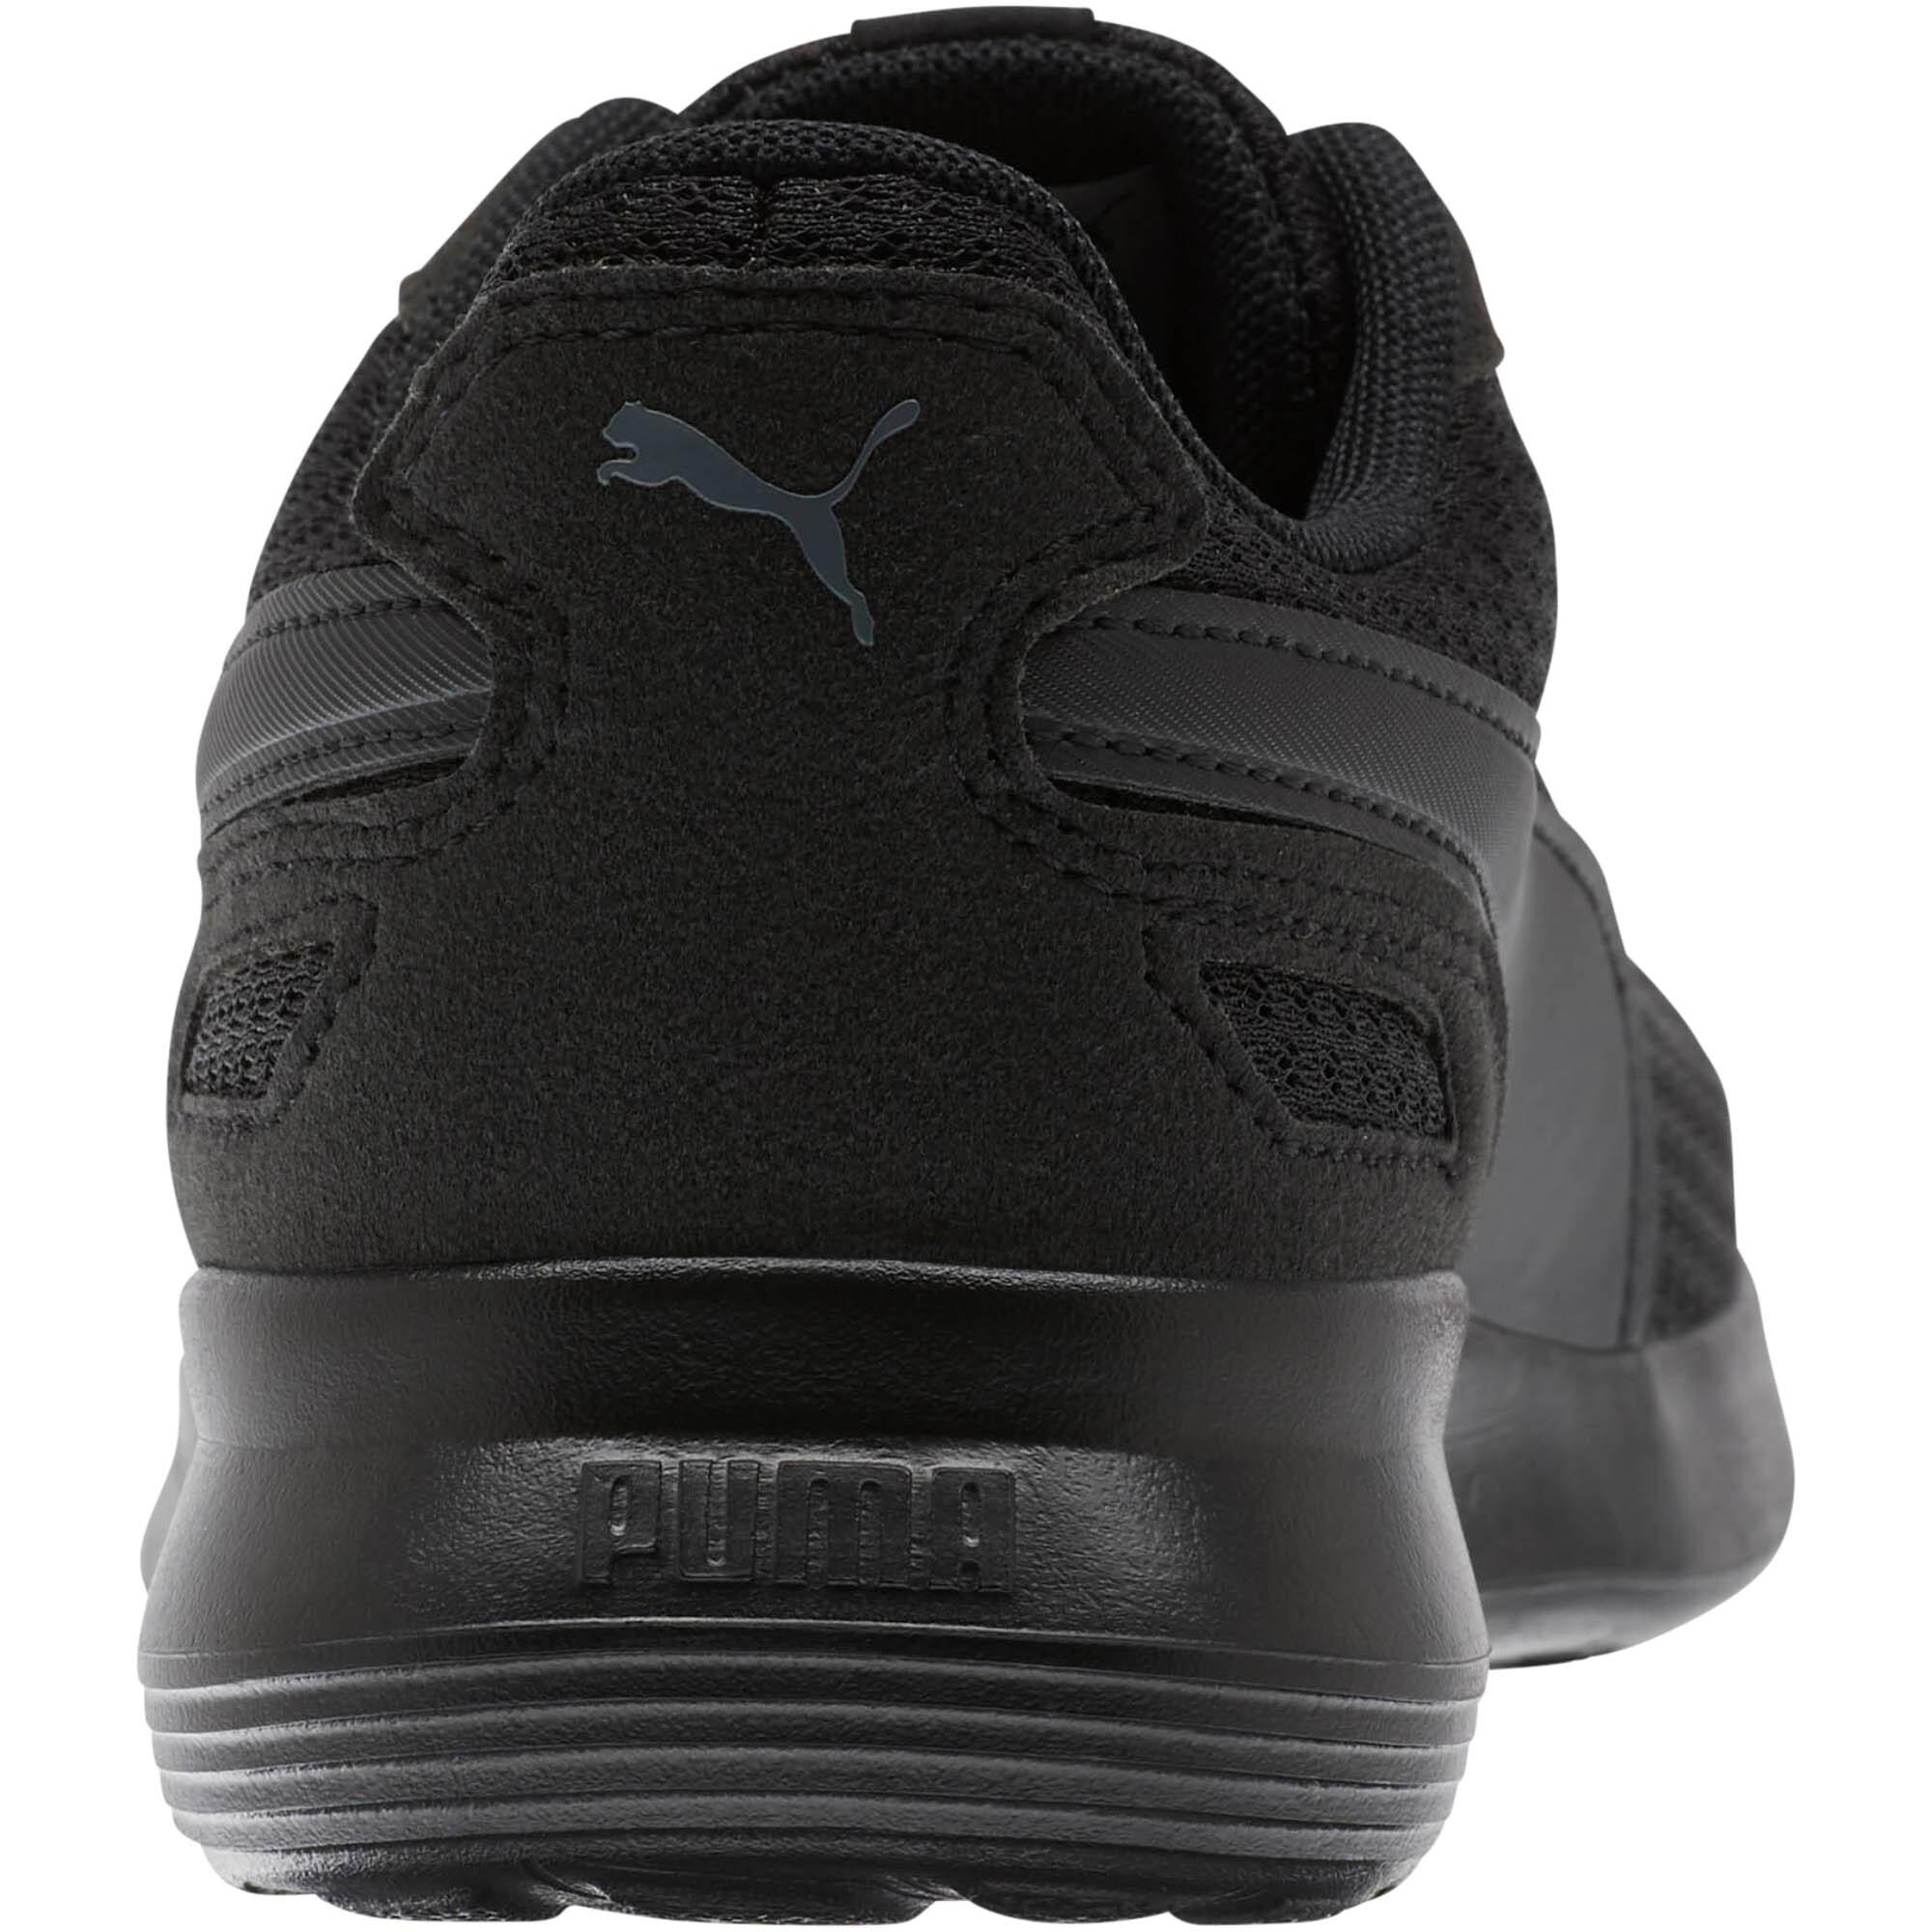 PUMA-ST-Activate-Women-s-Sneakers-Women-Shoe-Basics thumbnail 3